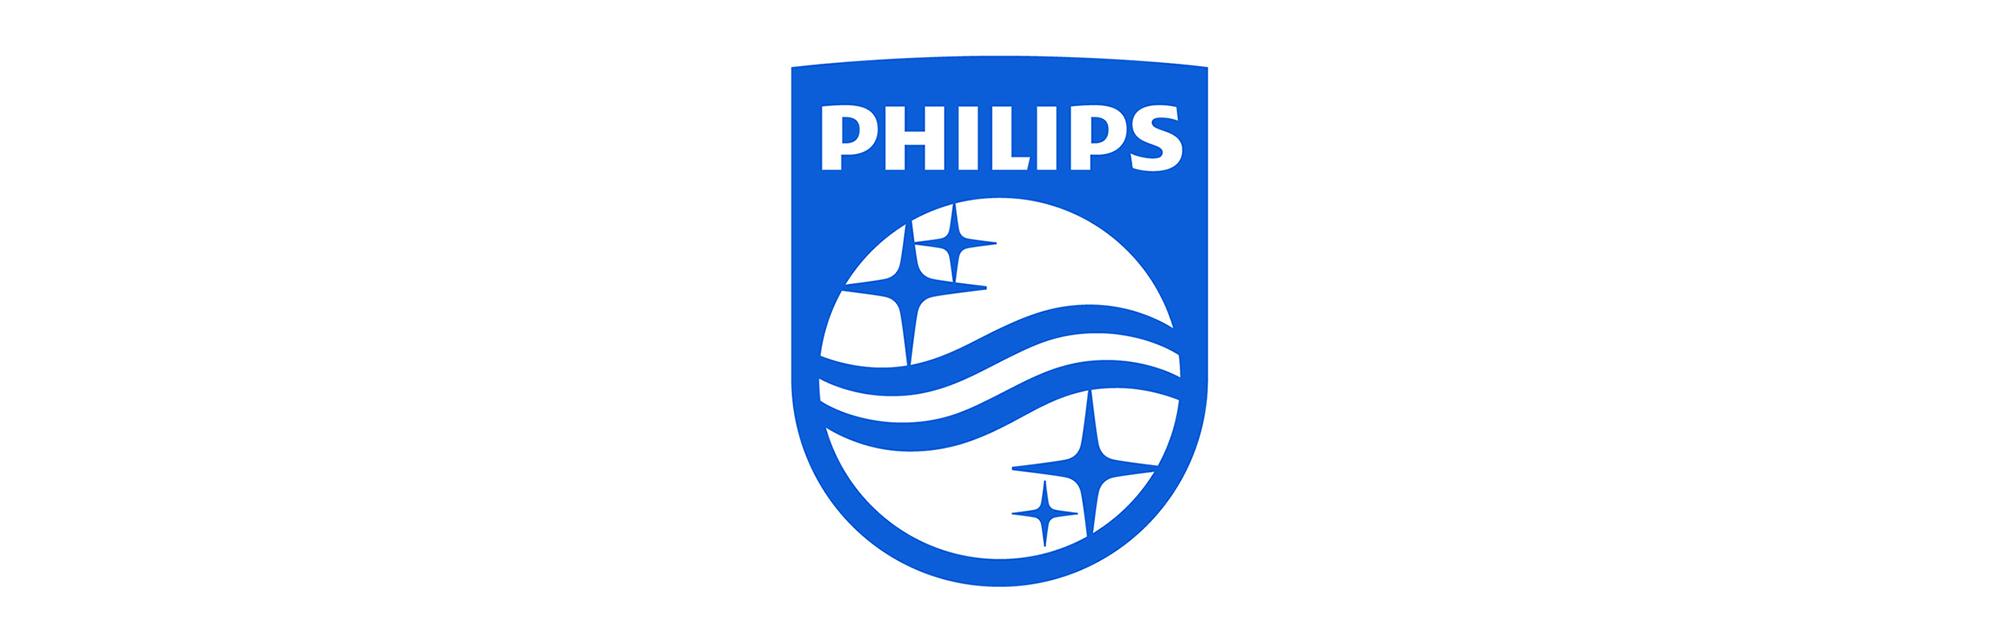 philips.logo_